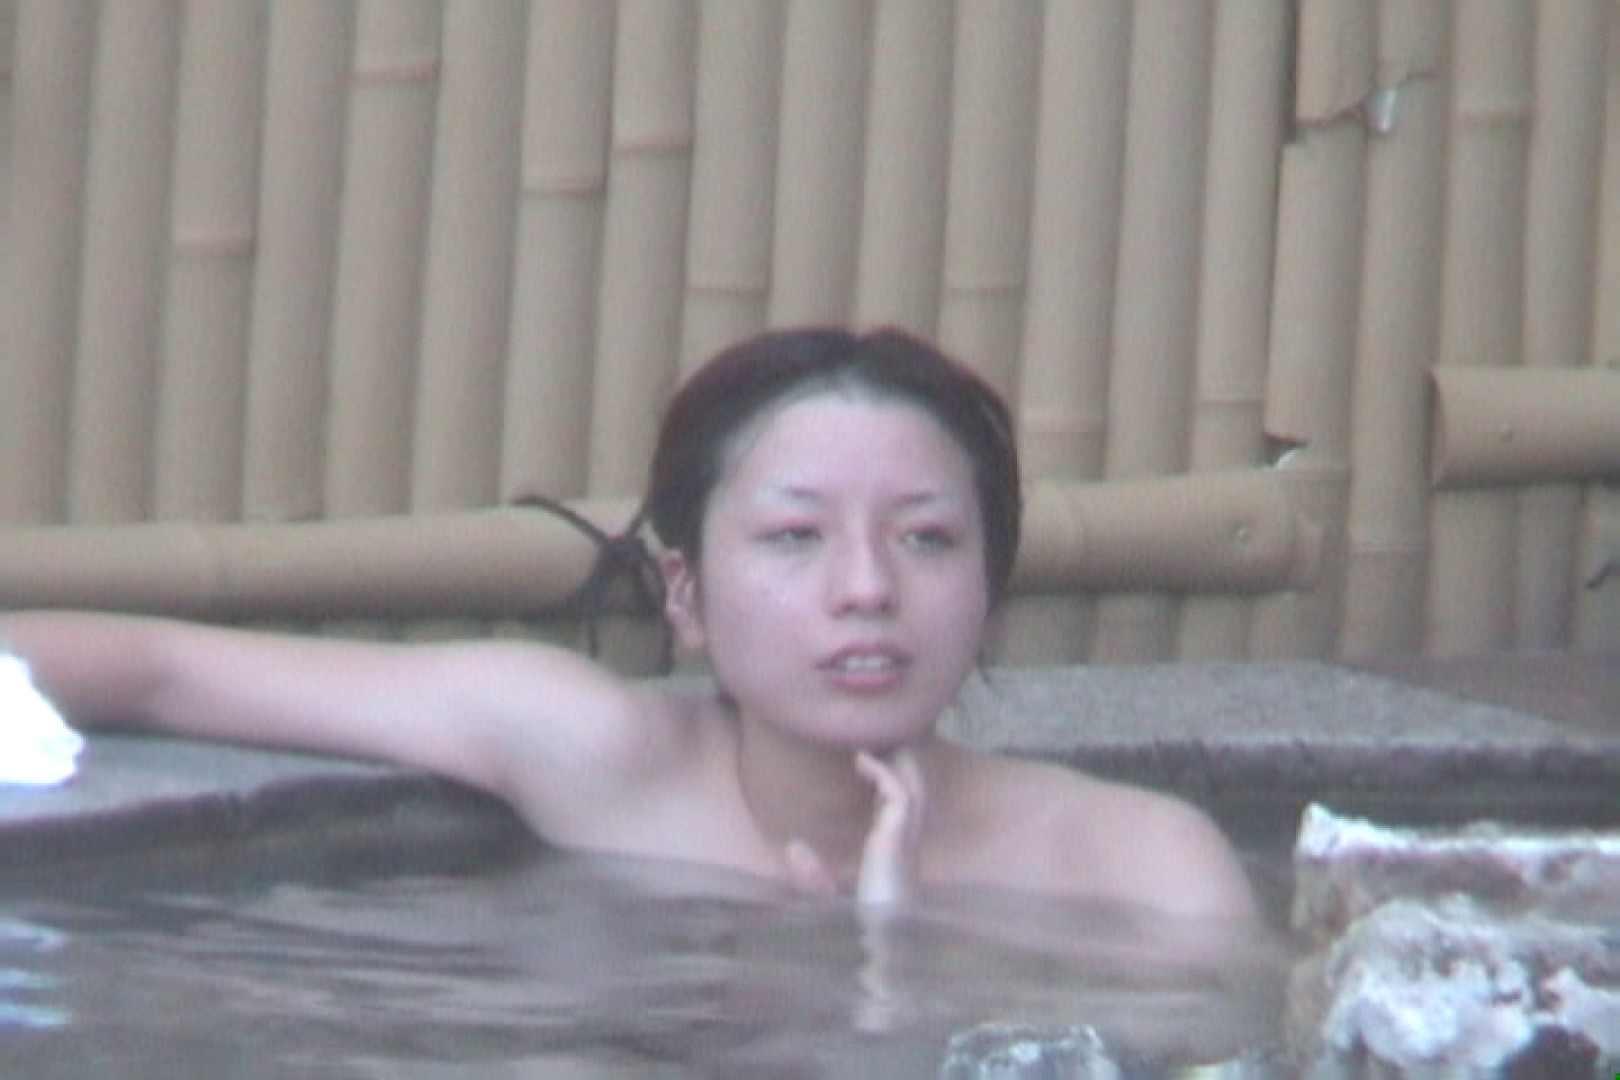 Aquaな露天風呂Vol.608 HなOL | 盗撮  89pic 65